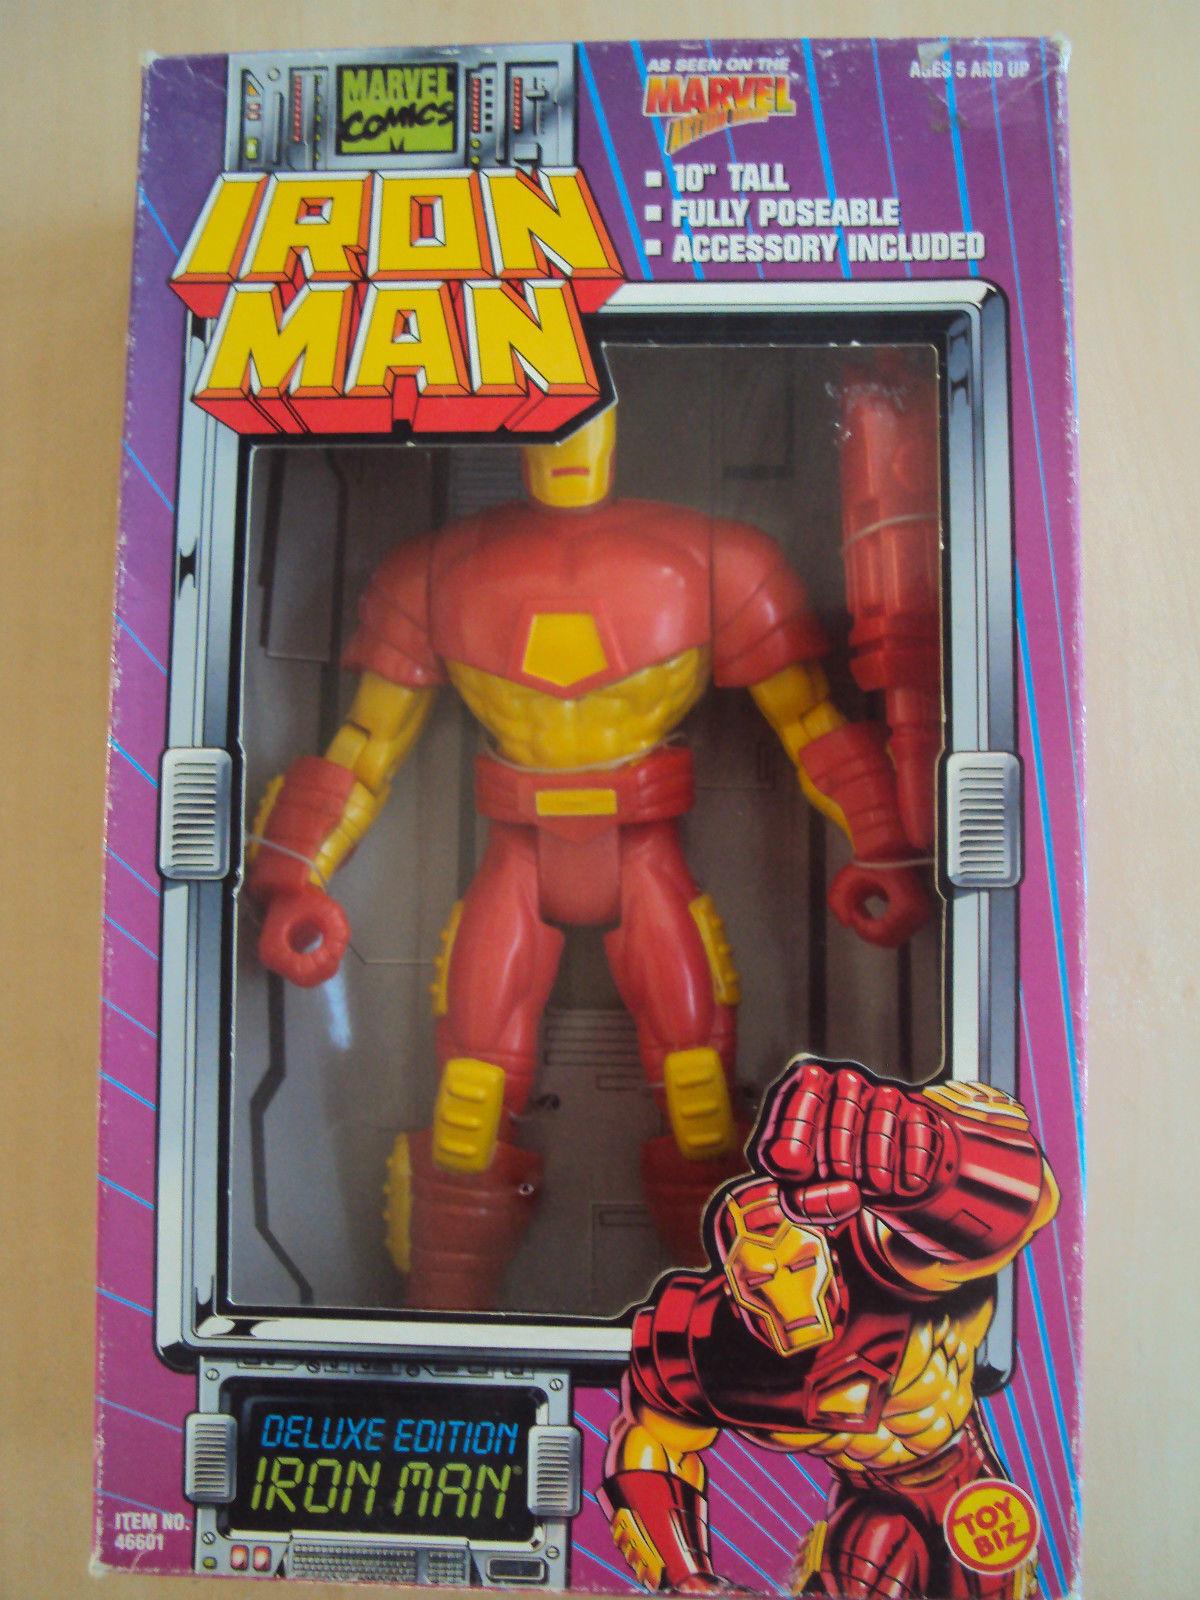 Marvel iron man  iron man (25 cm) new toy biz 10